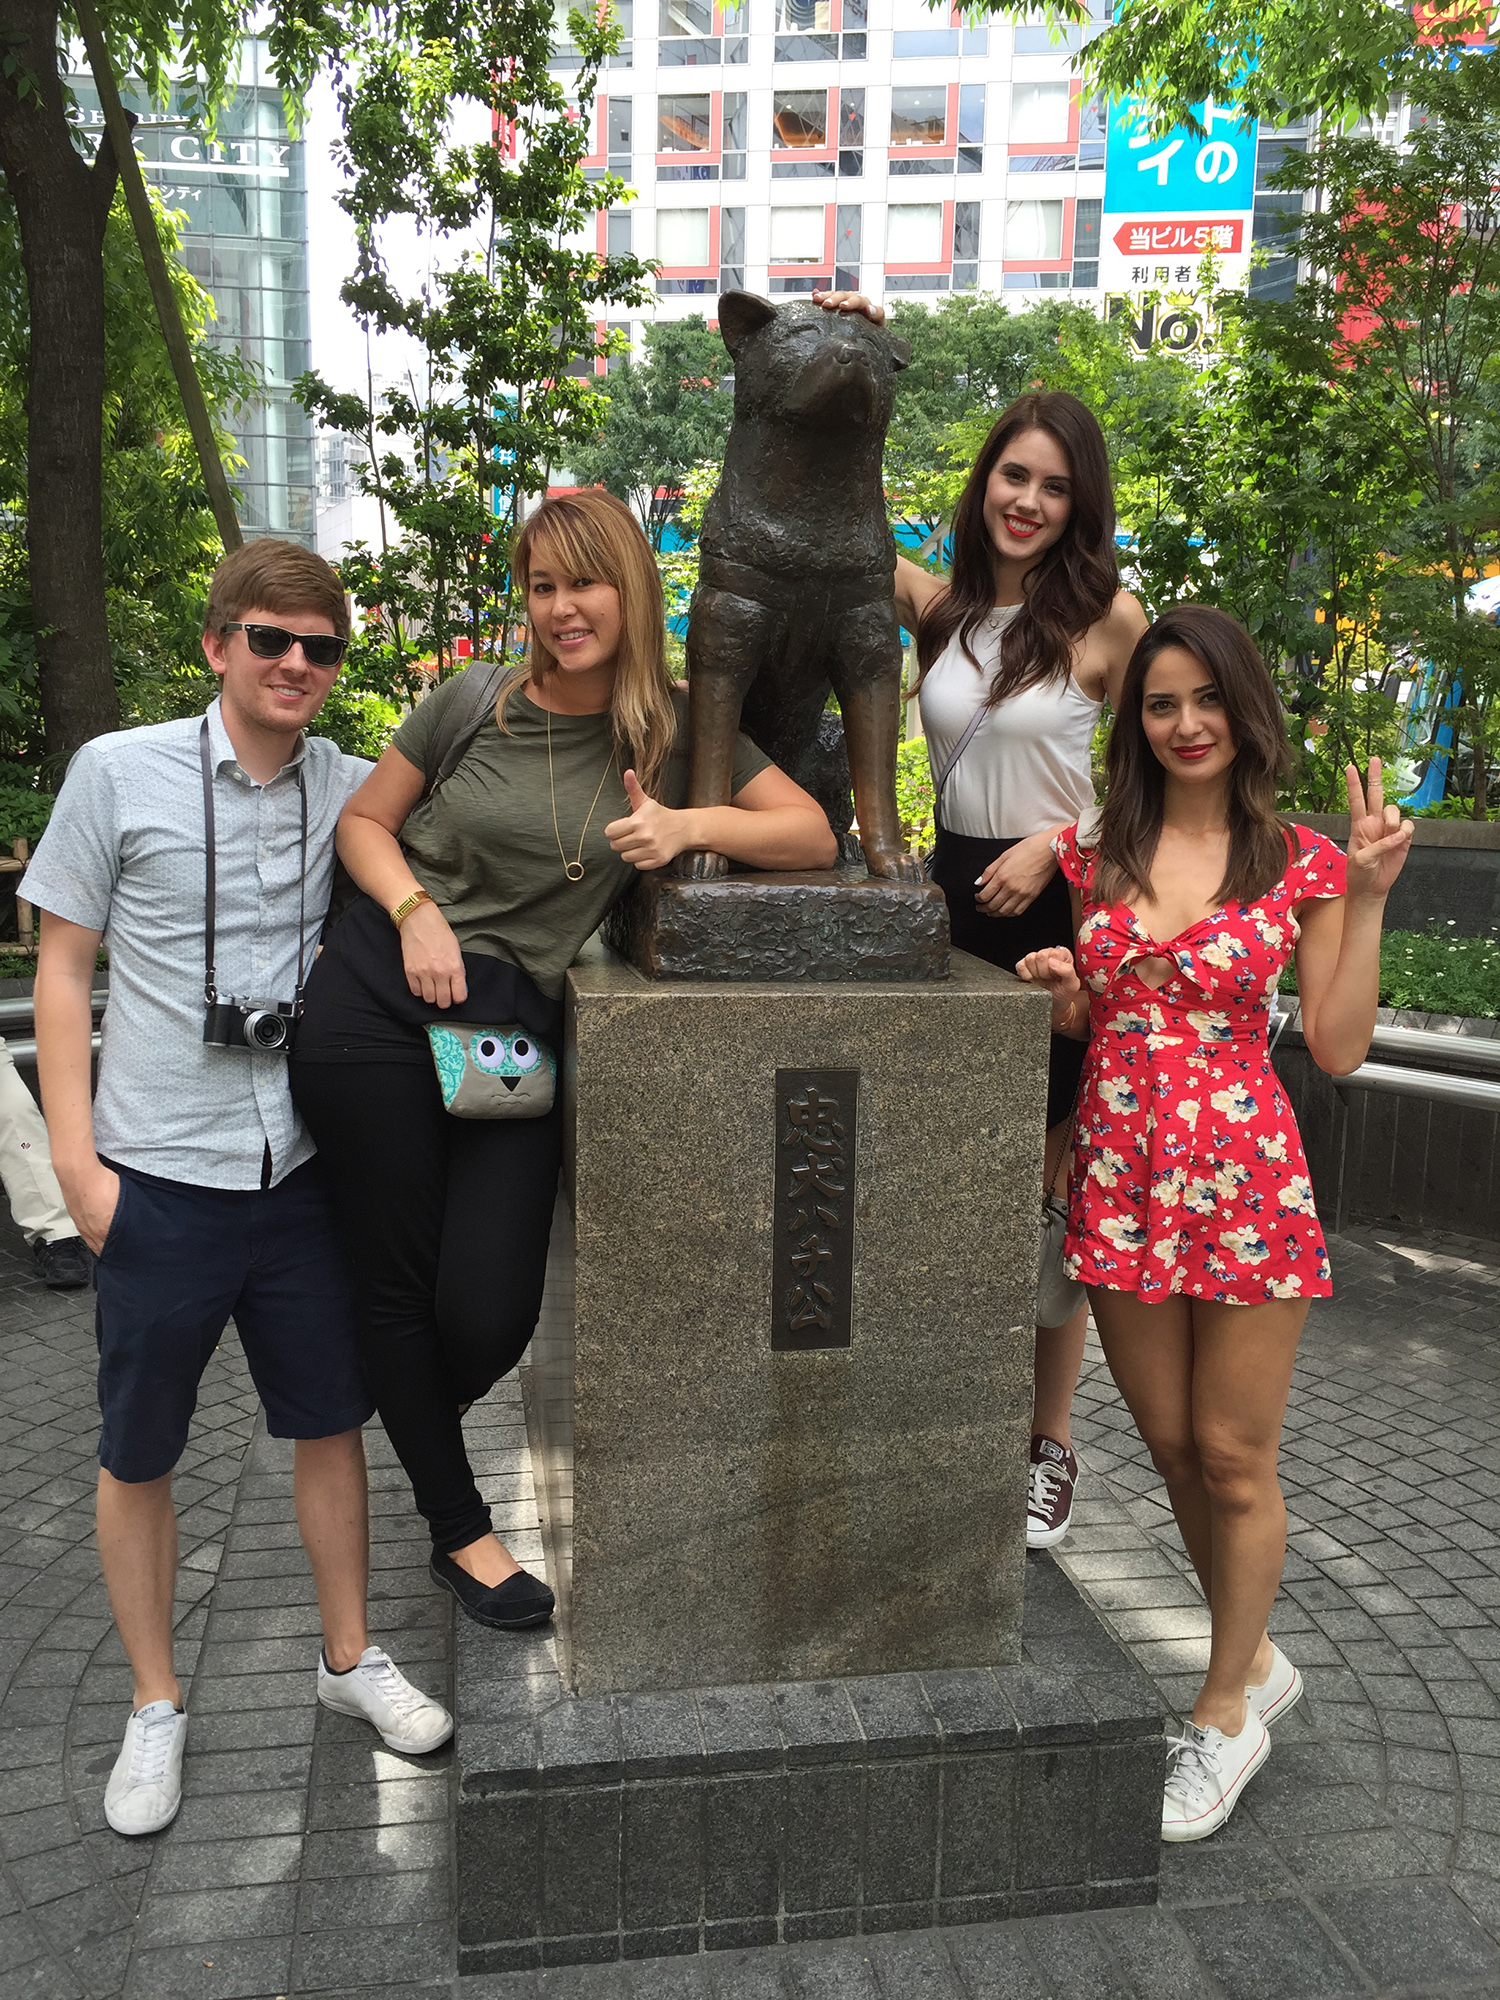 The famous Hachiko meeting spot in Shibuya